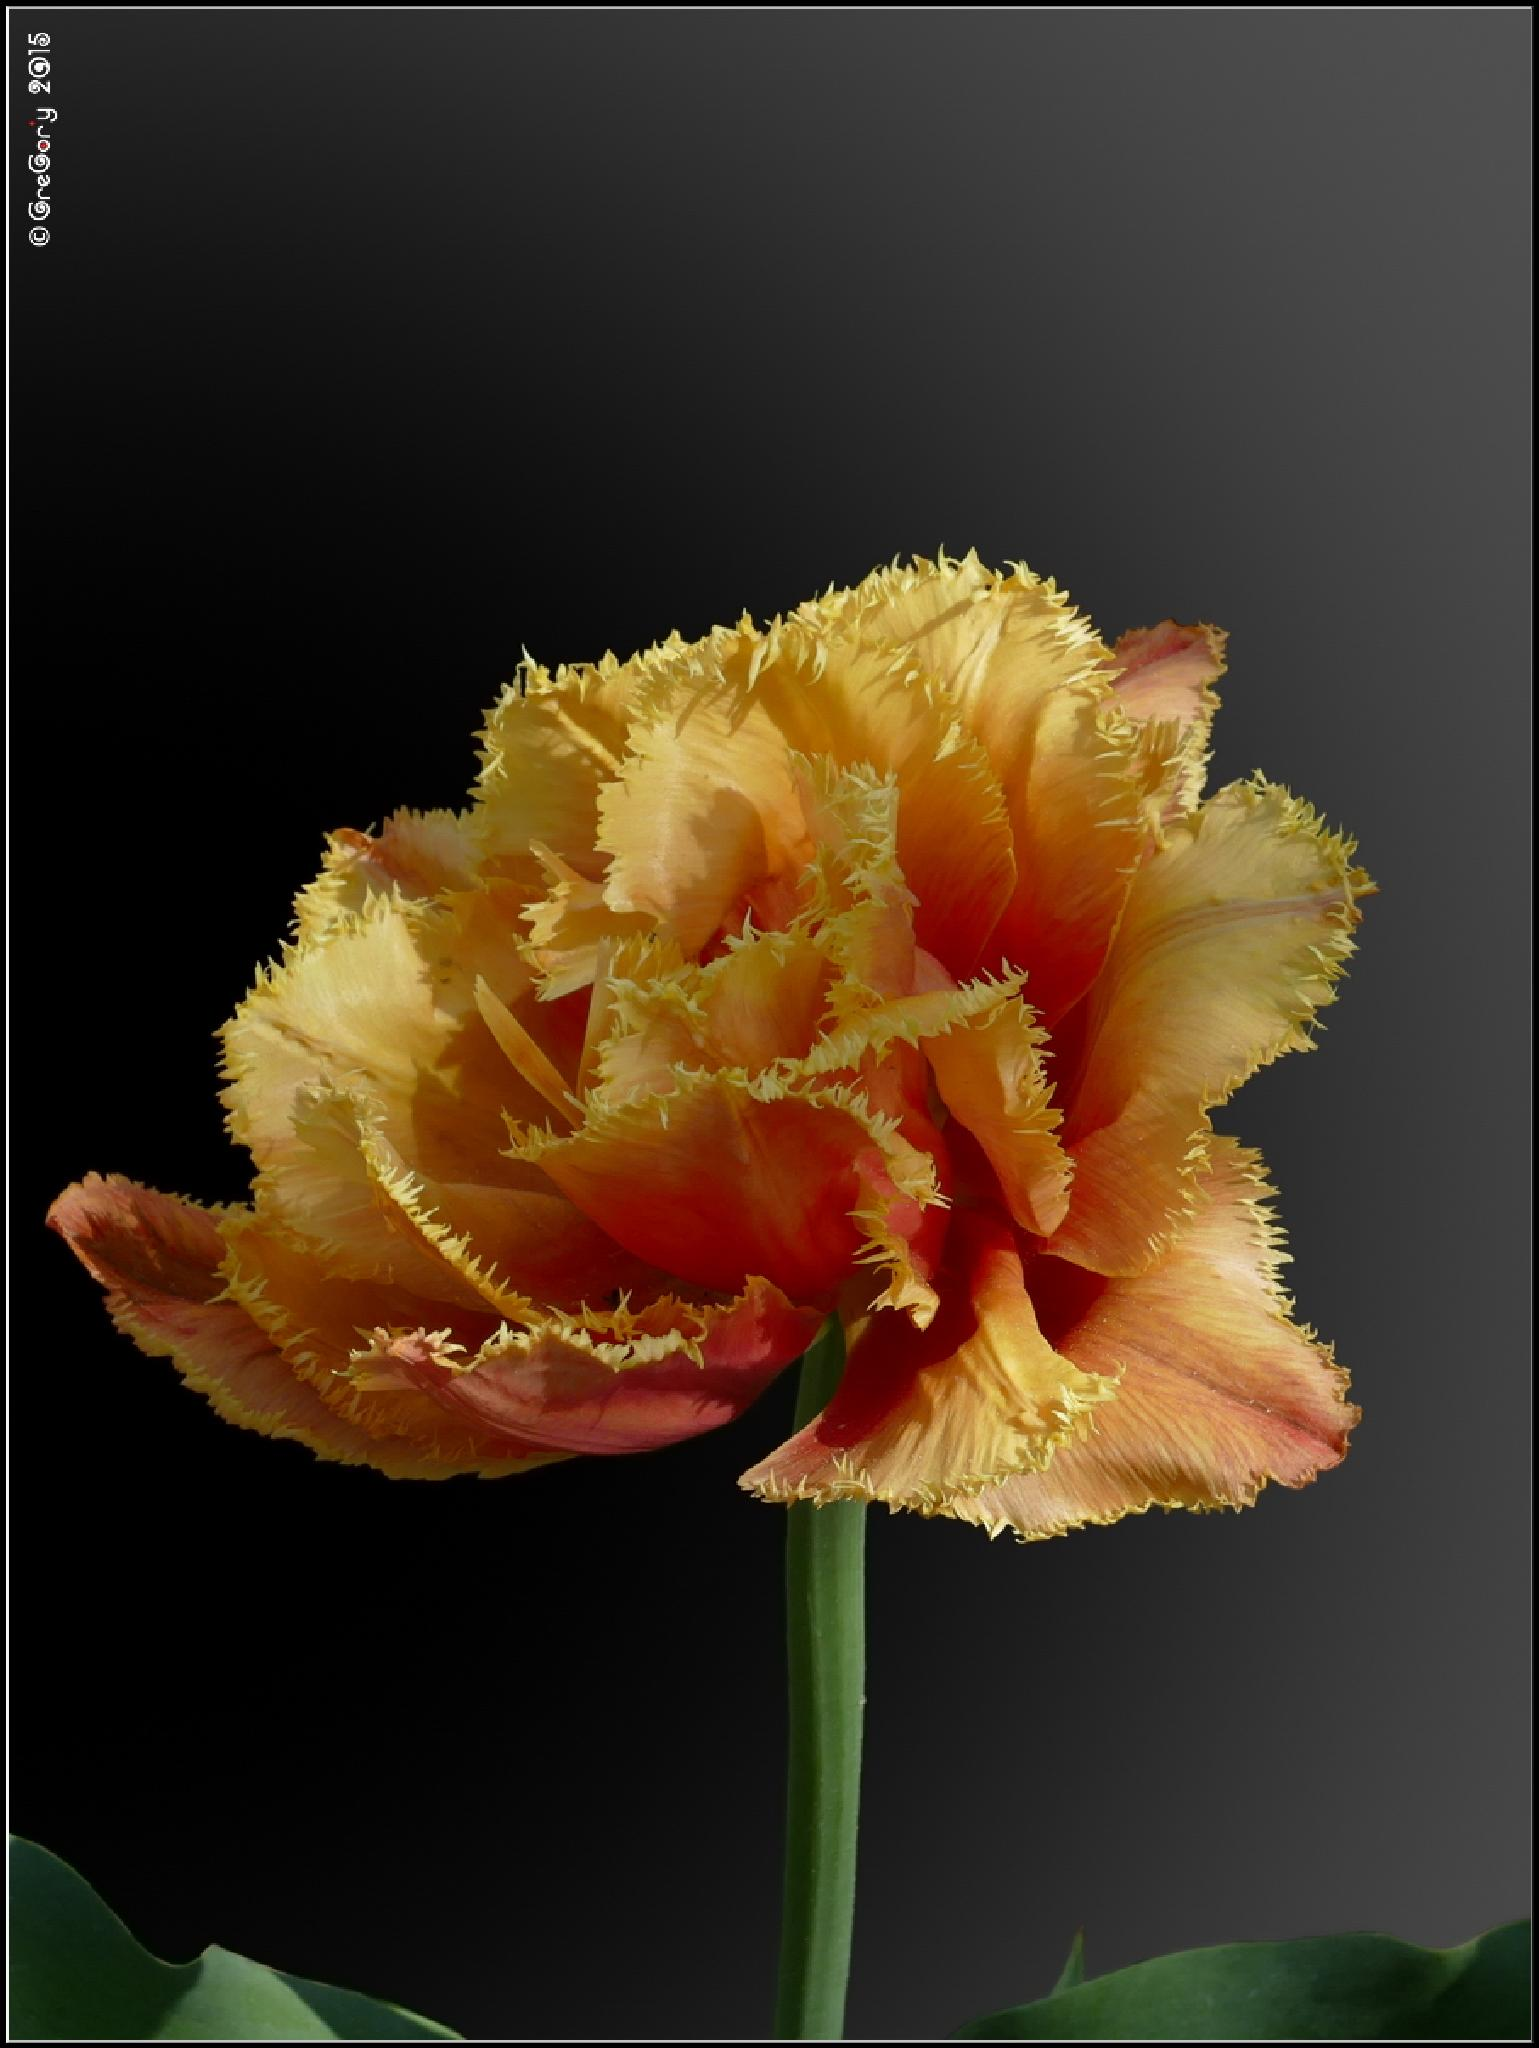 Тюльпан / Tulip / Tulipa by CreGory